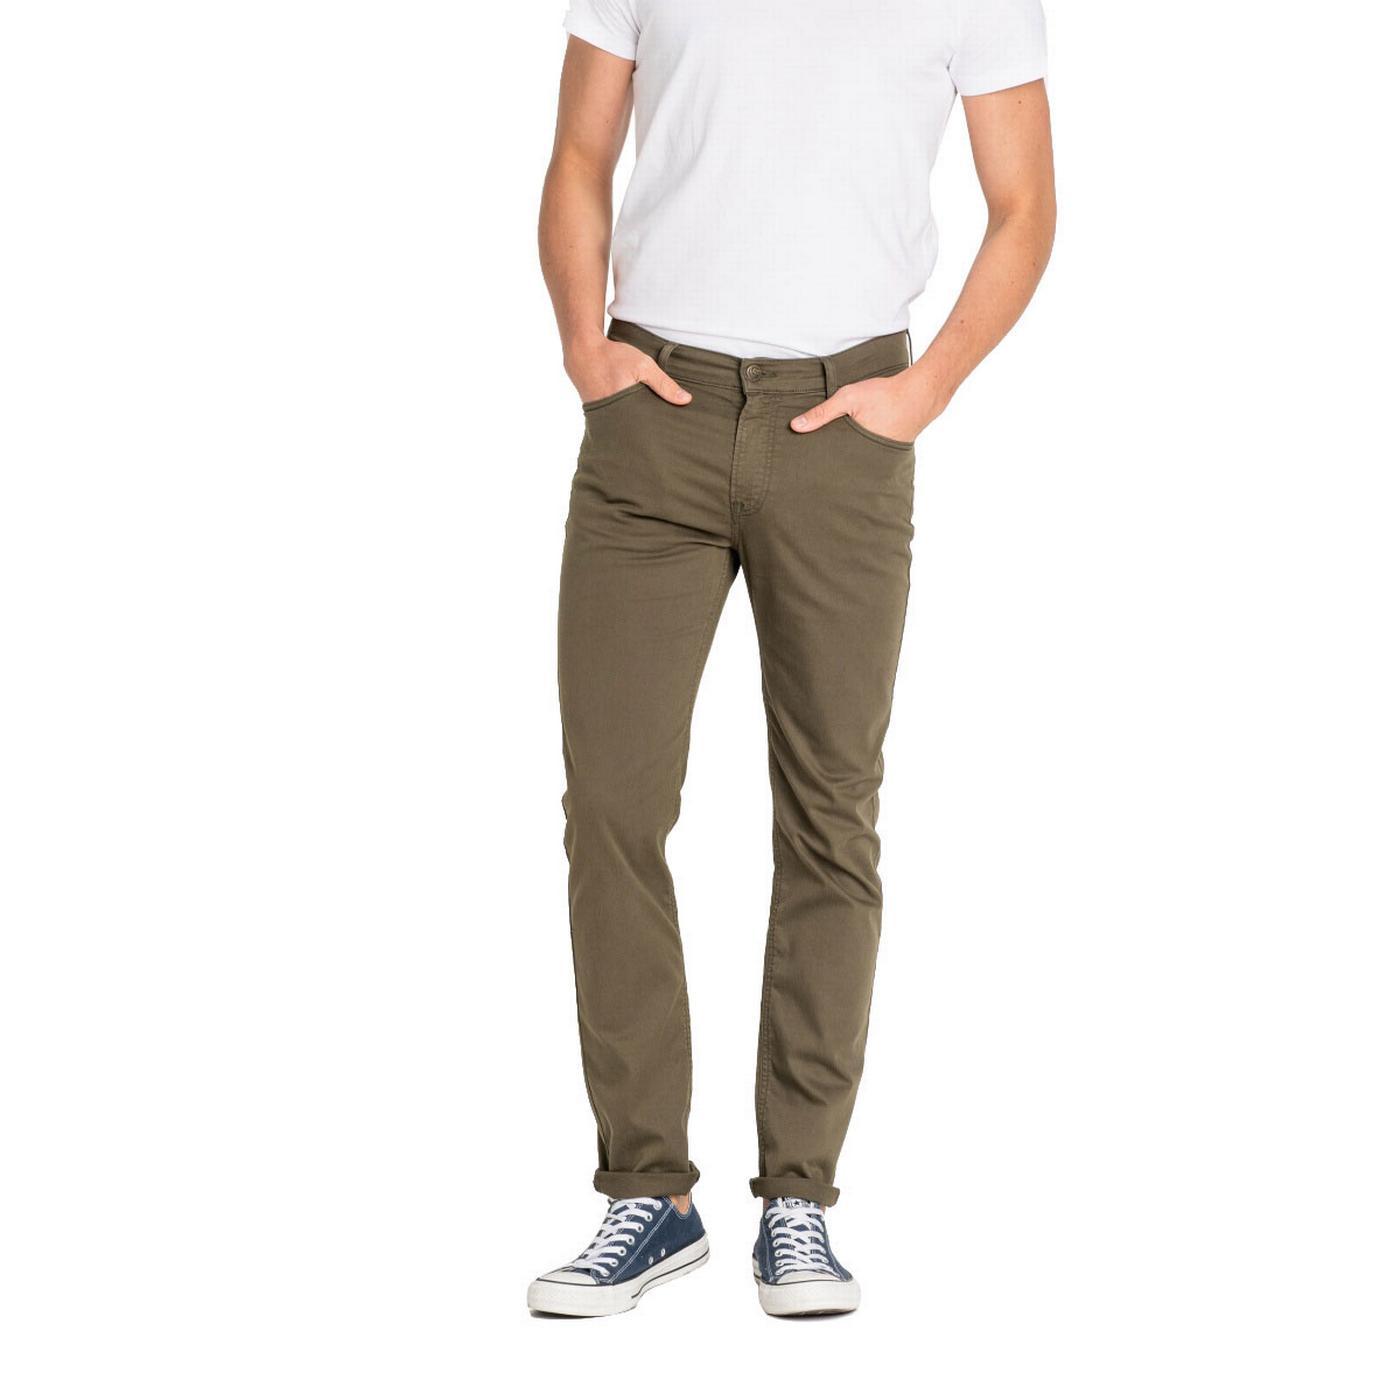 Rider LEE Men's Retro Slim Leg Chinos - IVY GREEN